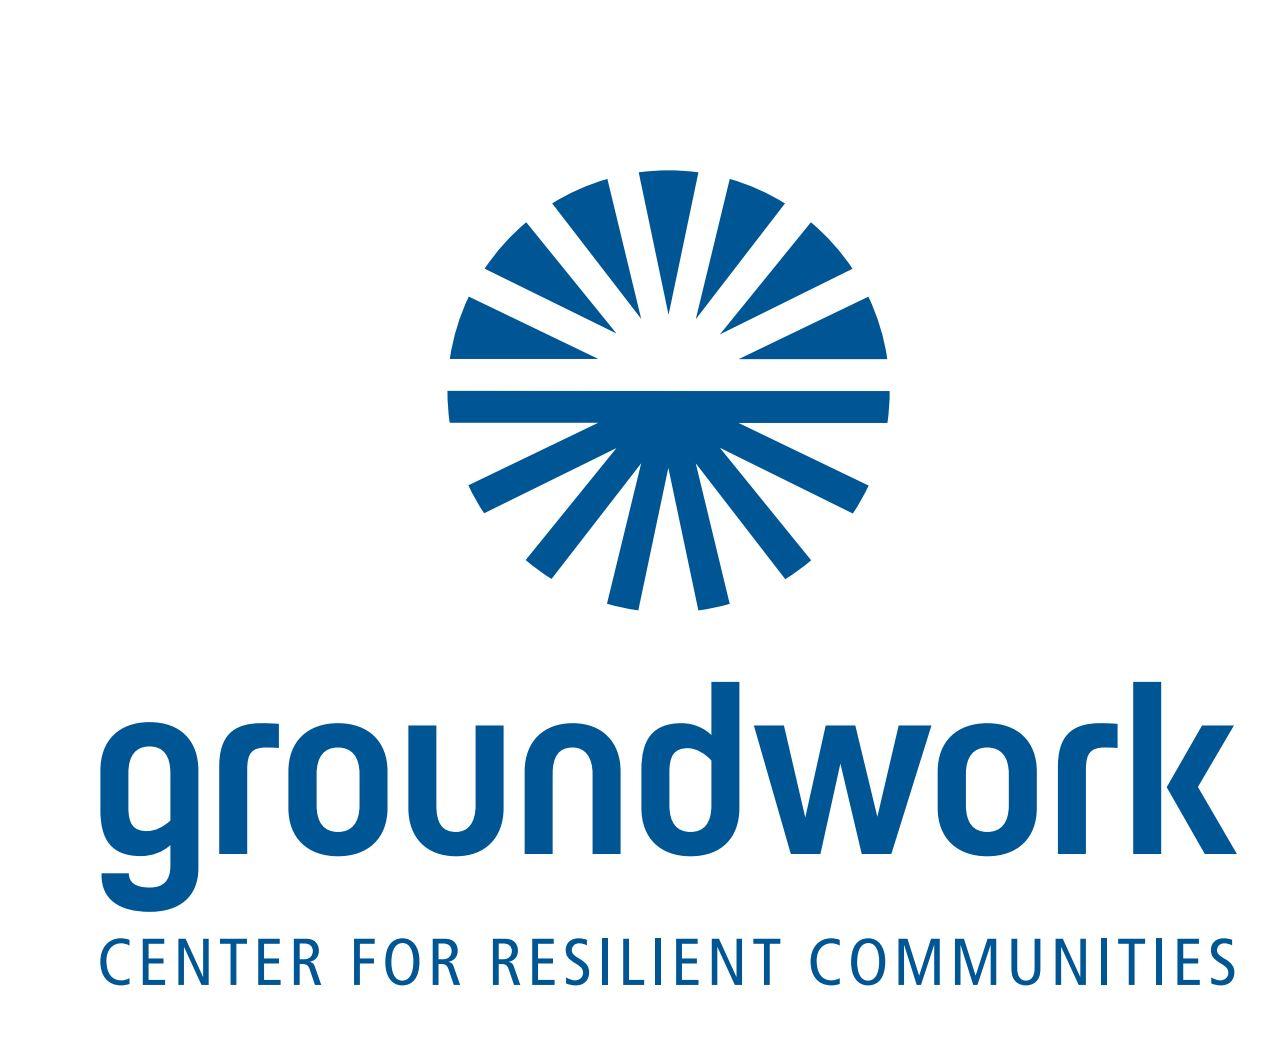 groundworklogo.JPG